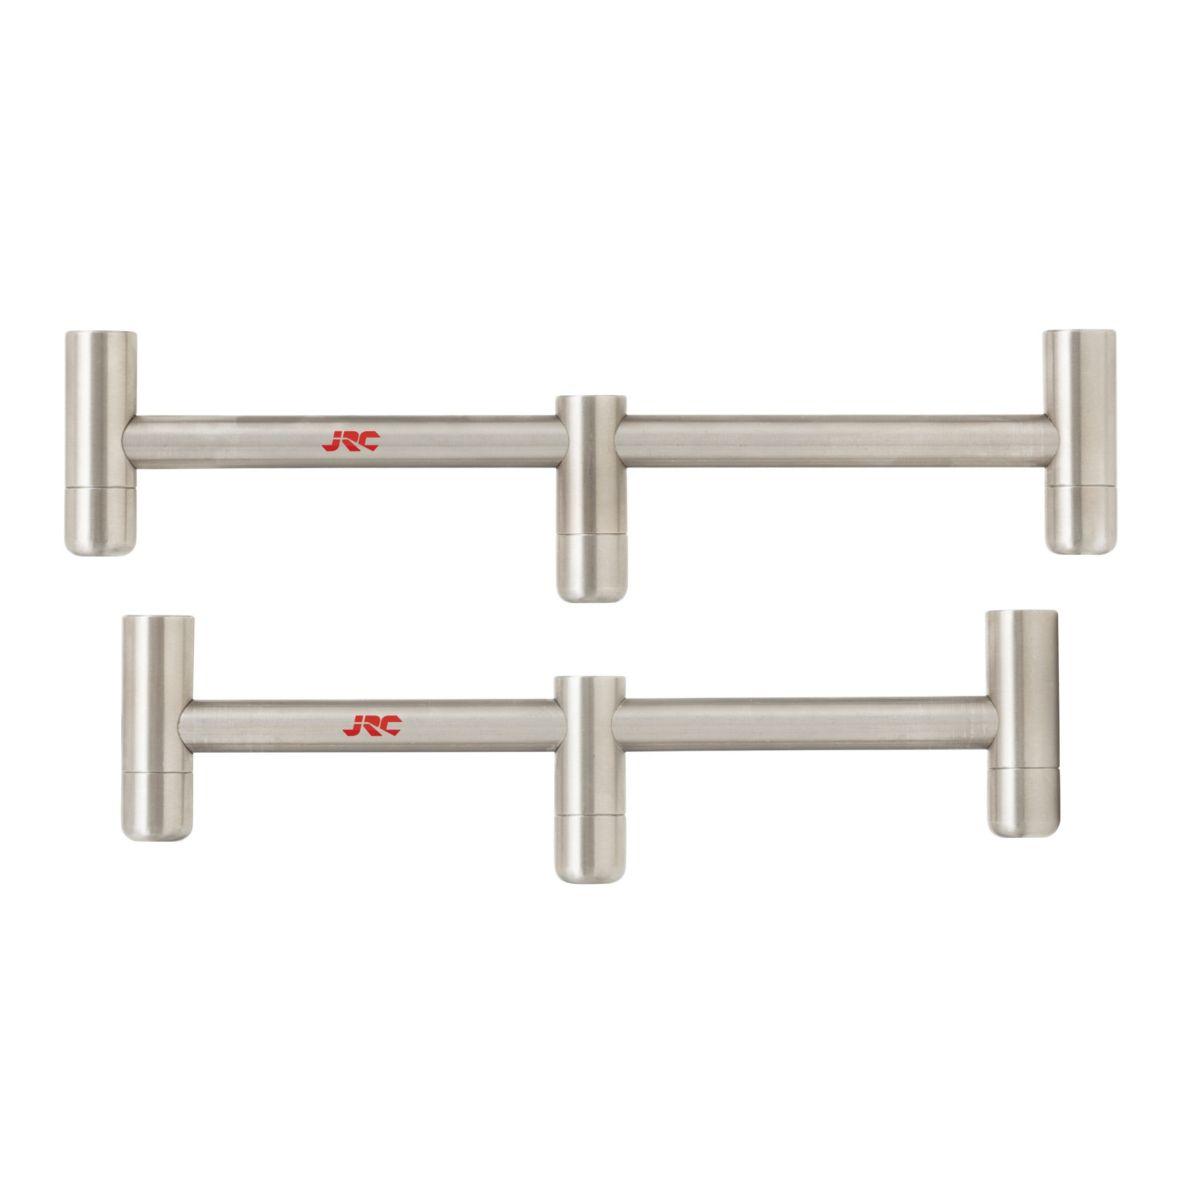 JRC Hrazda na 3 pruty JRC Extreme TXS Buzz Bar 2 Rod